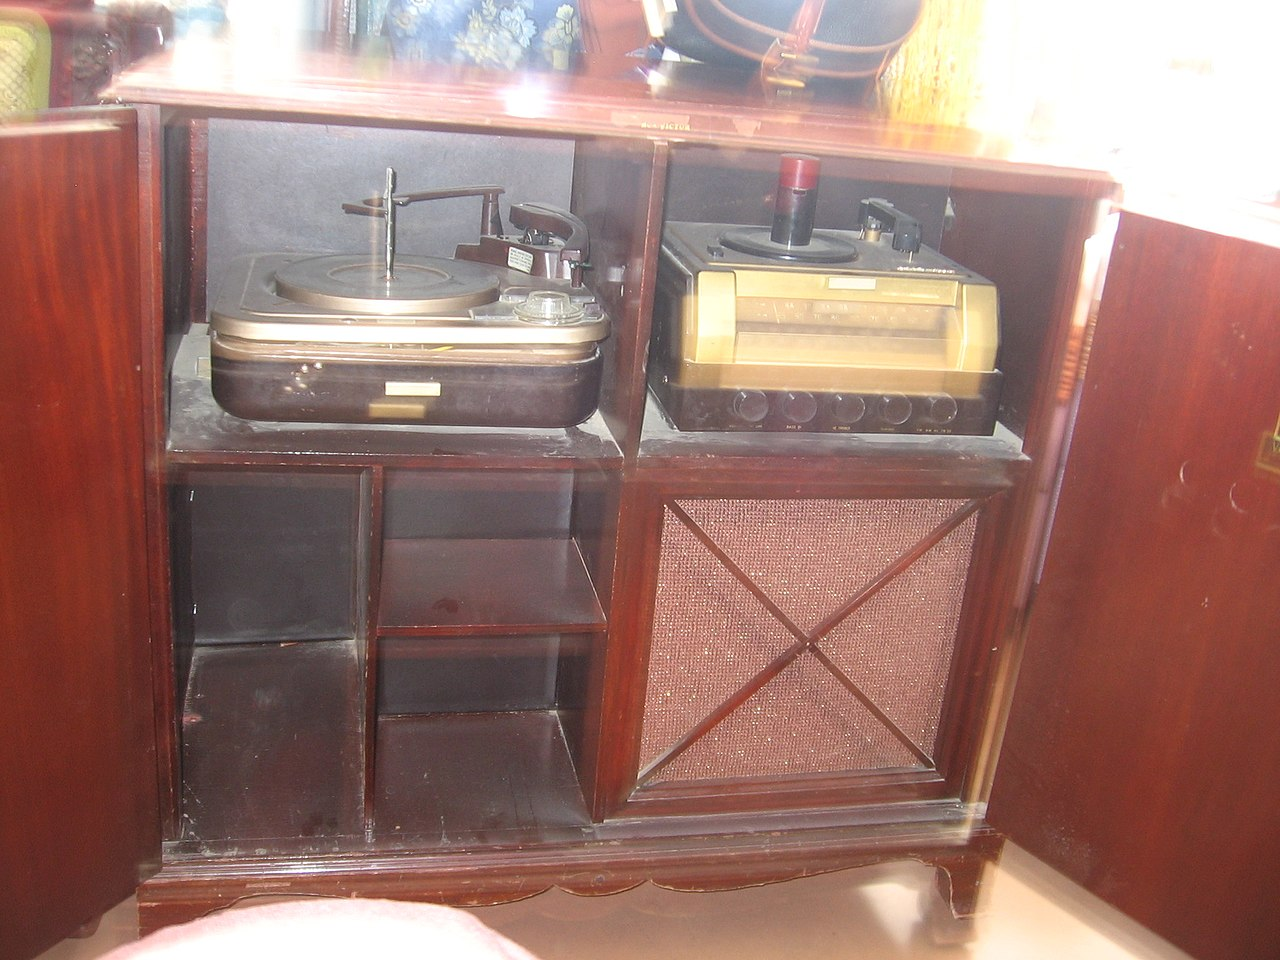 File:RCA Victor Victrola phonograph and radio Model A-108.jpg ...